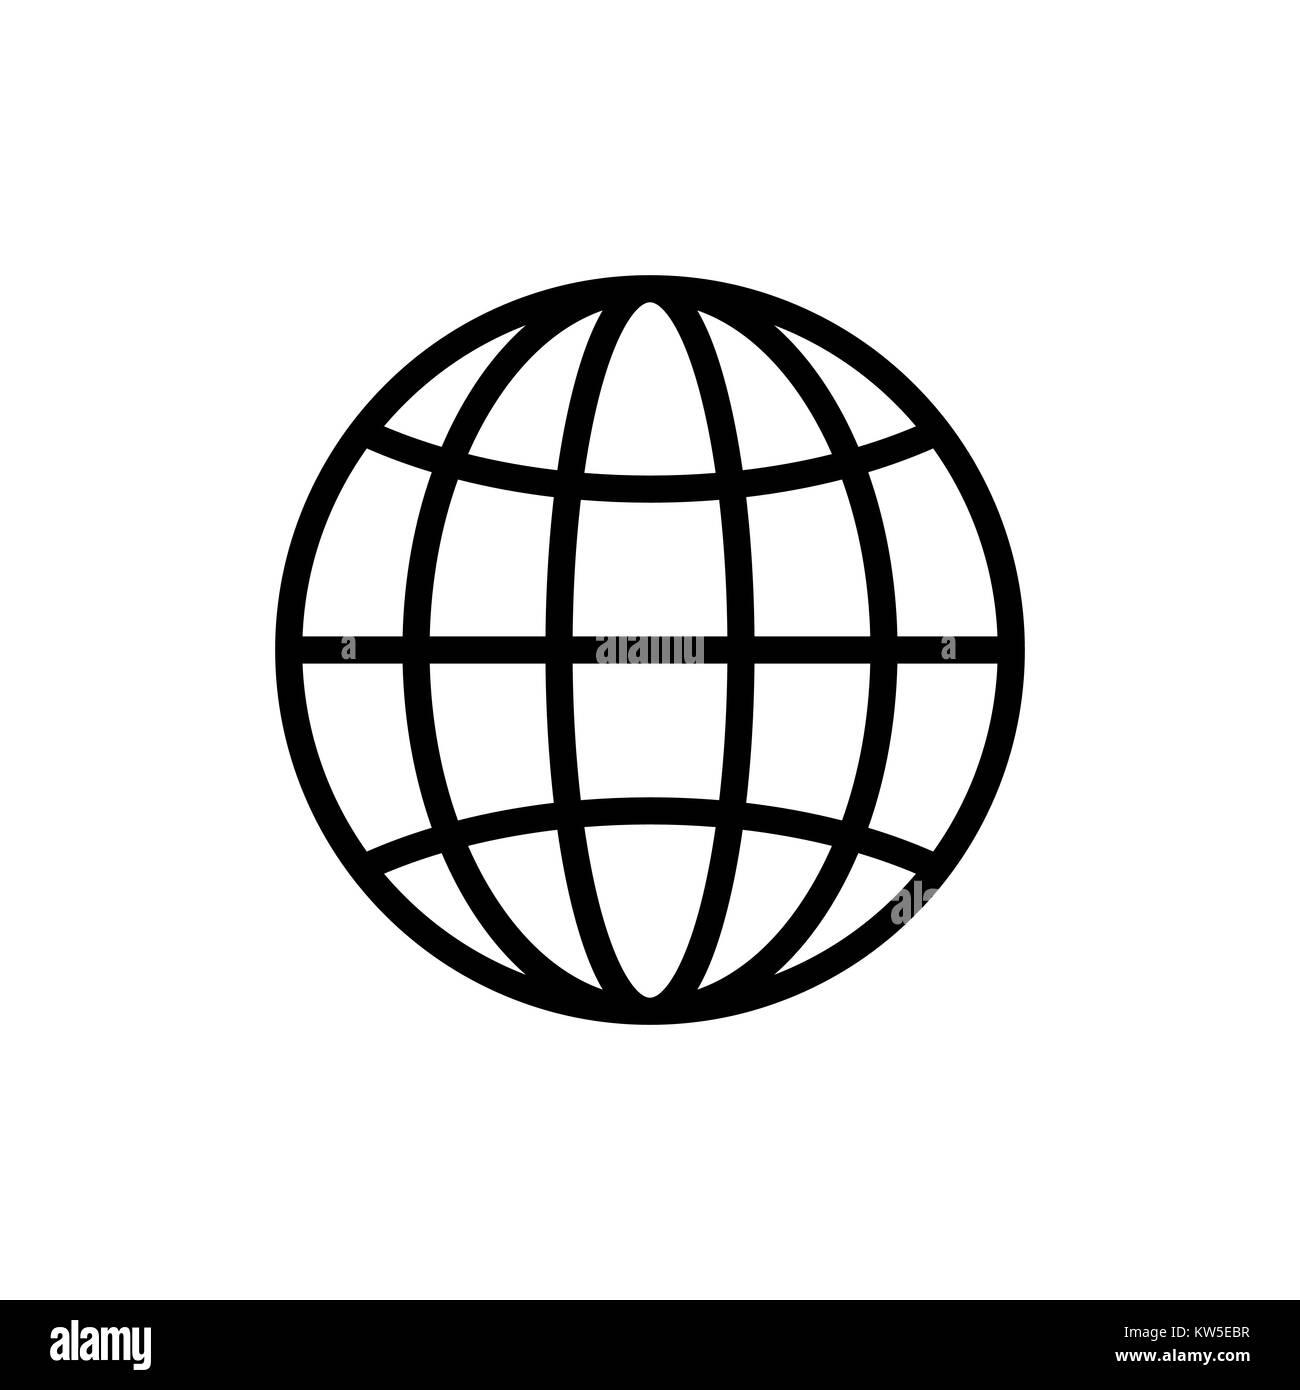 Earth icon isolated isolated on white background - Stock Image